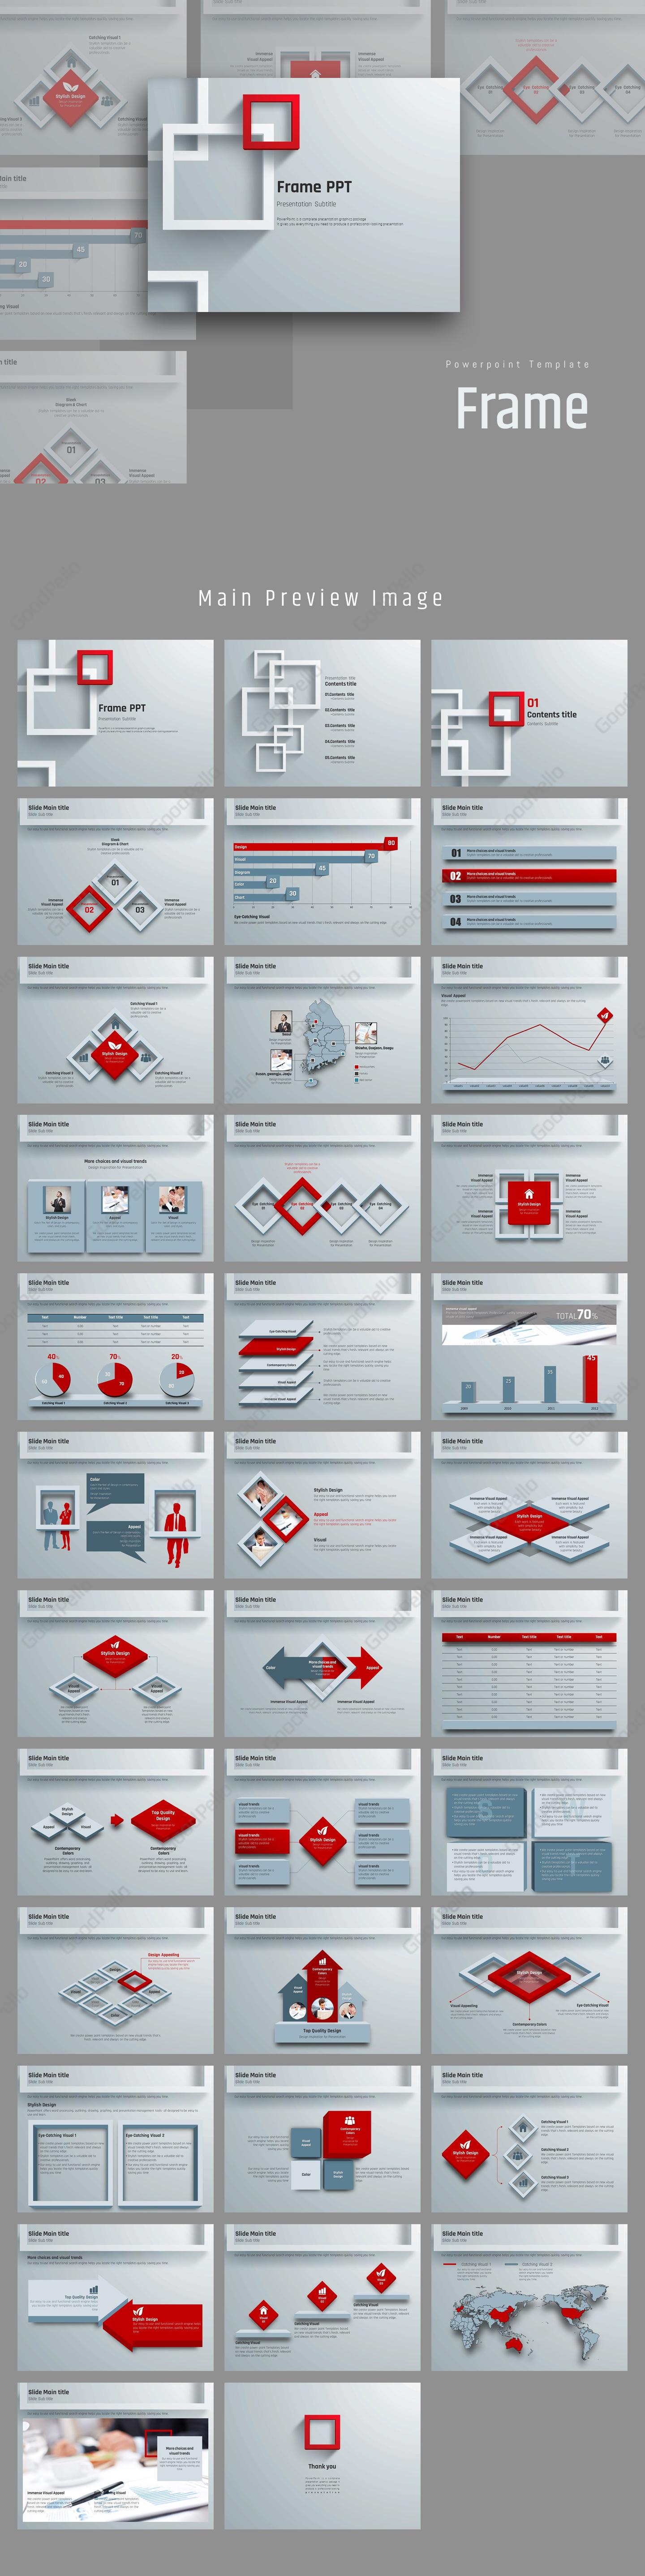 Frame Animated Powerpoint Template 고퀄리티 프레젠테이션 템플릿 굿펠로